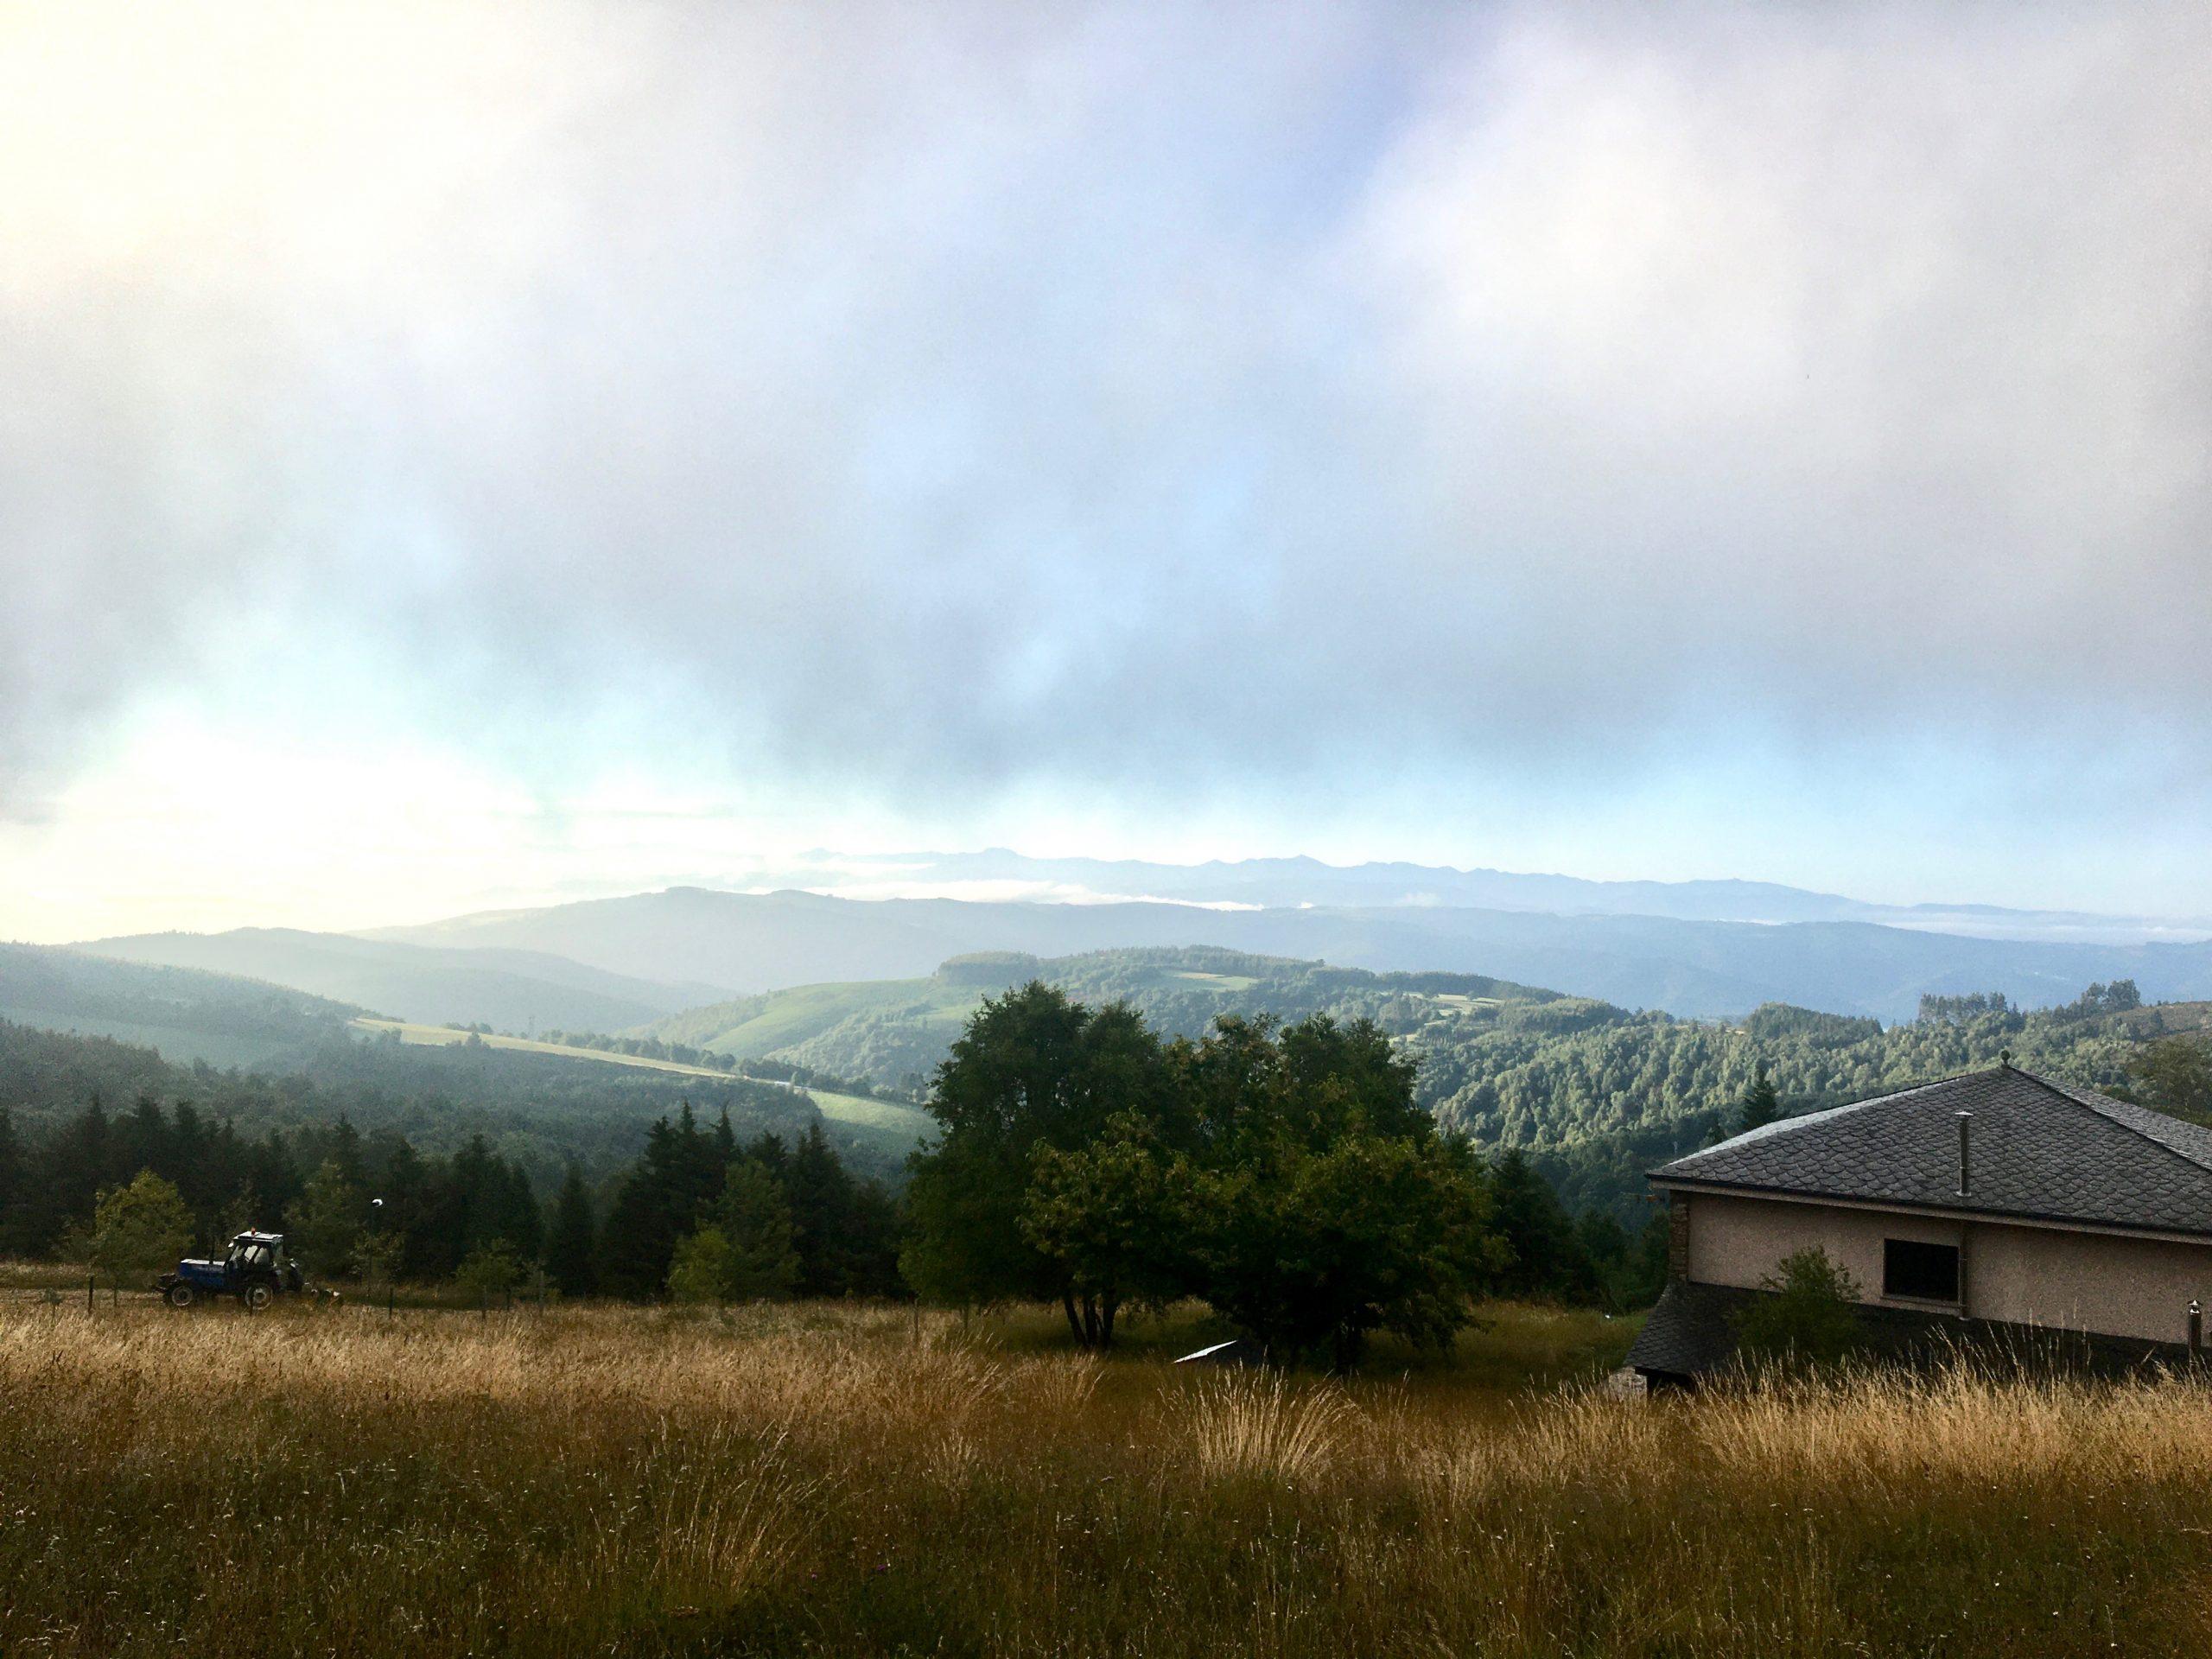 Morning light, Day 6 on the Camino Primitivo